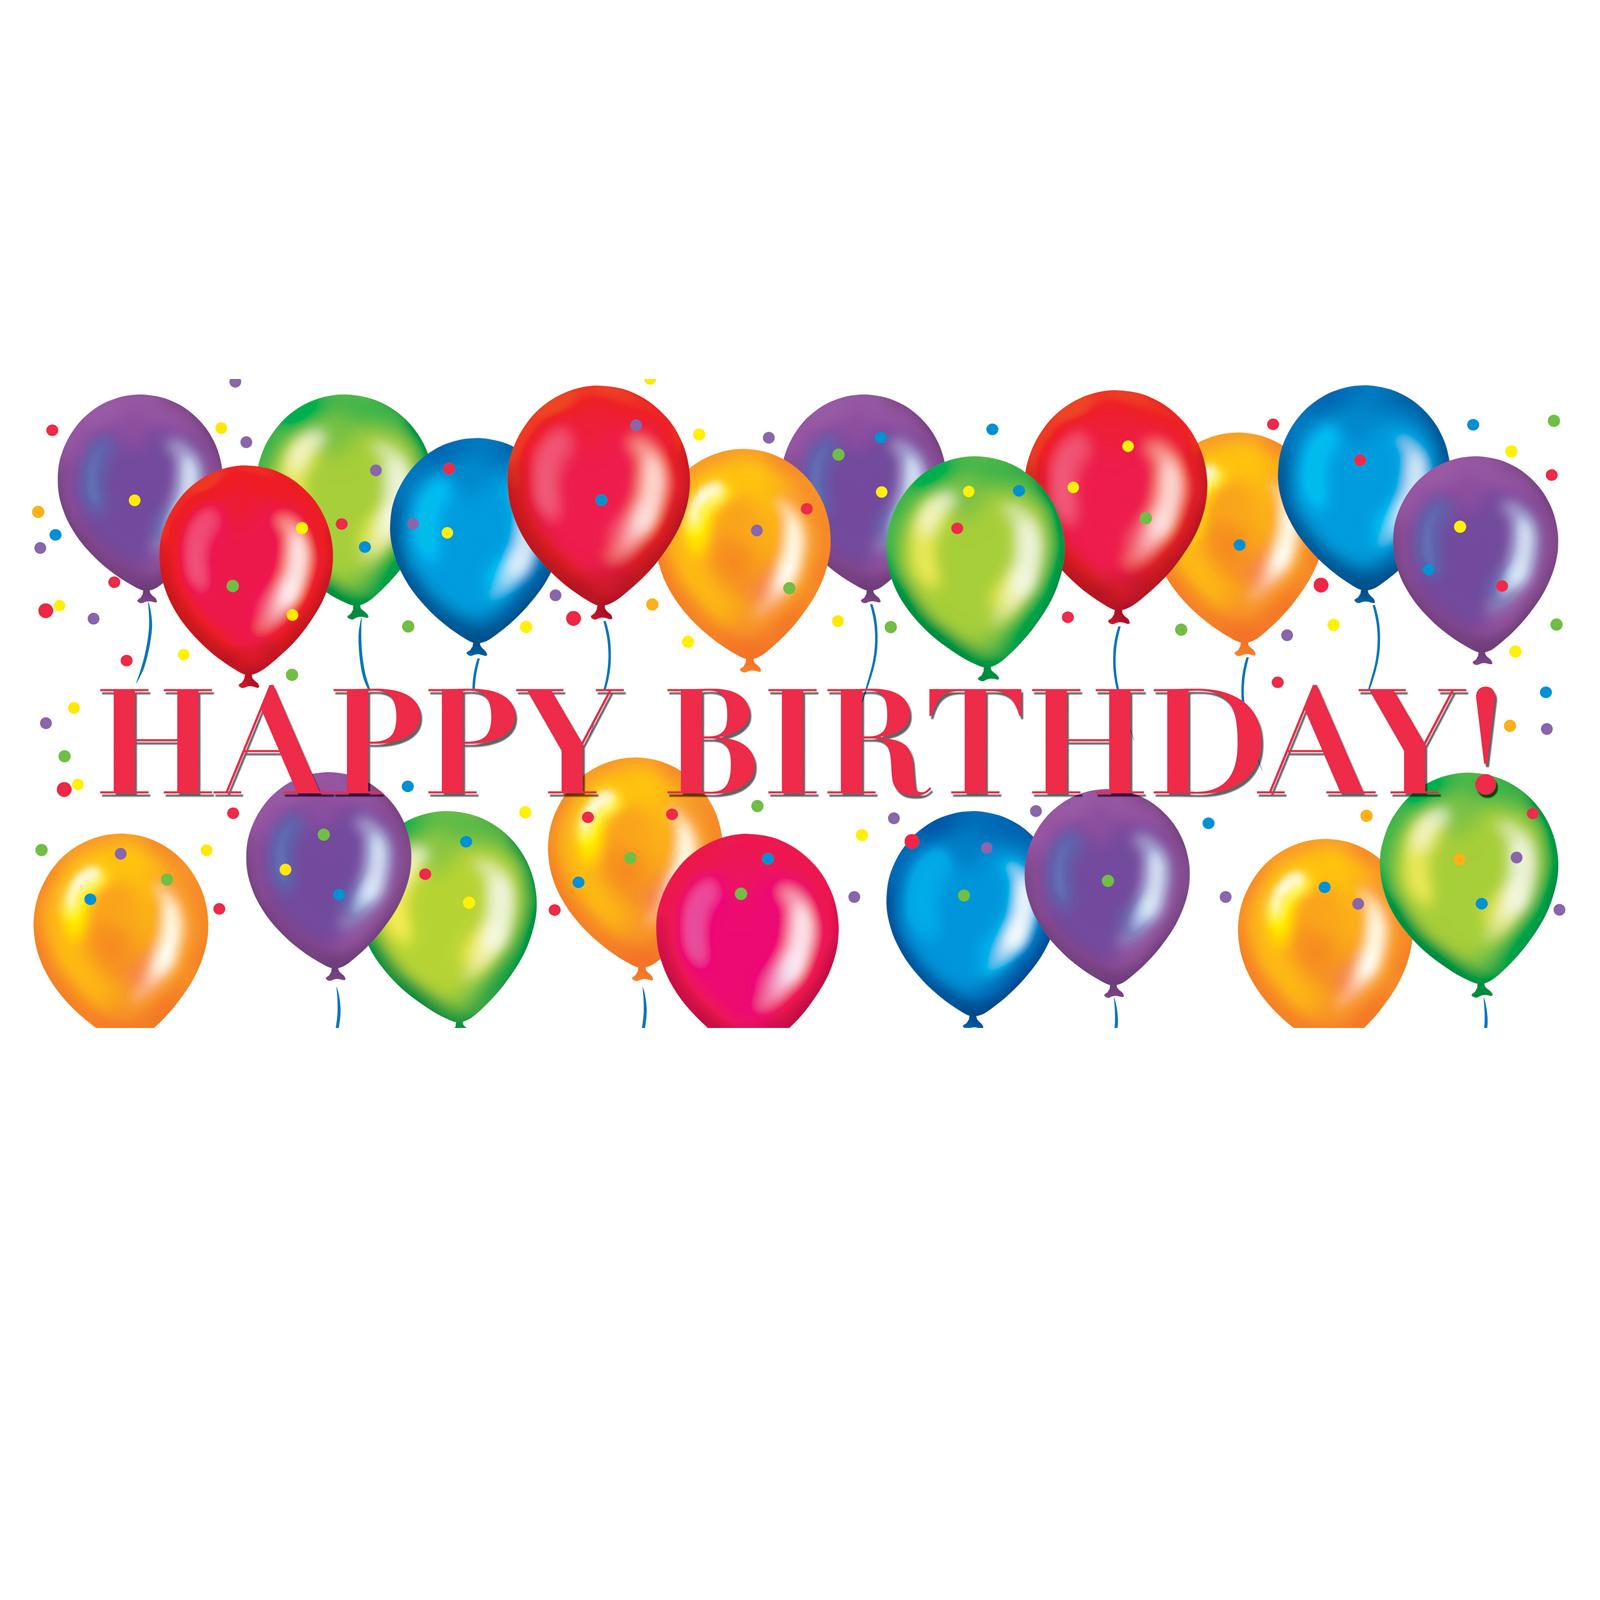 1600x1600 Free Clipart Of Birthday